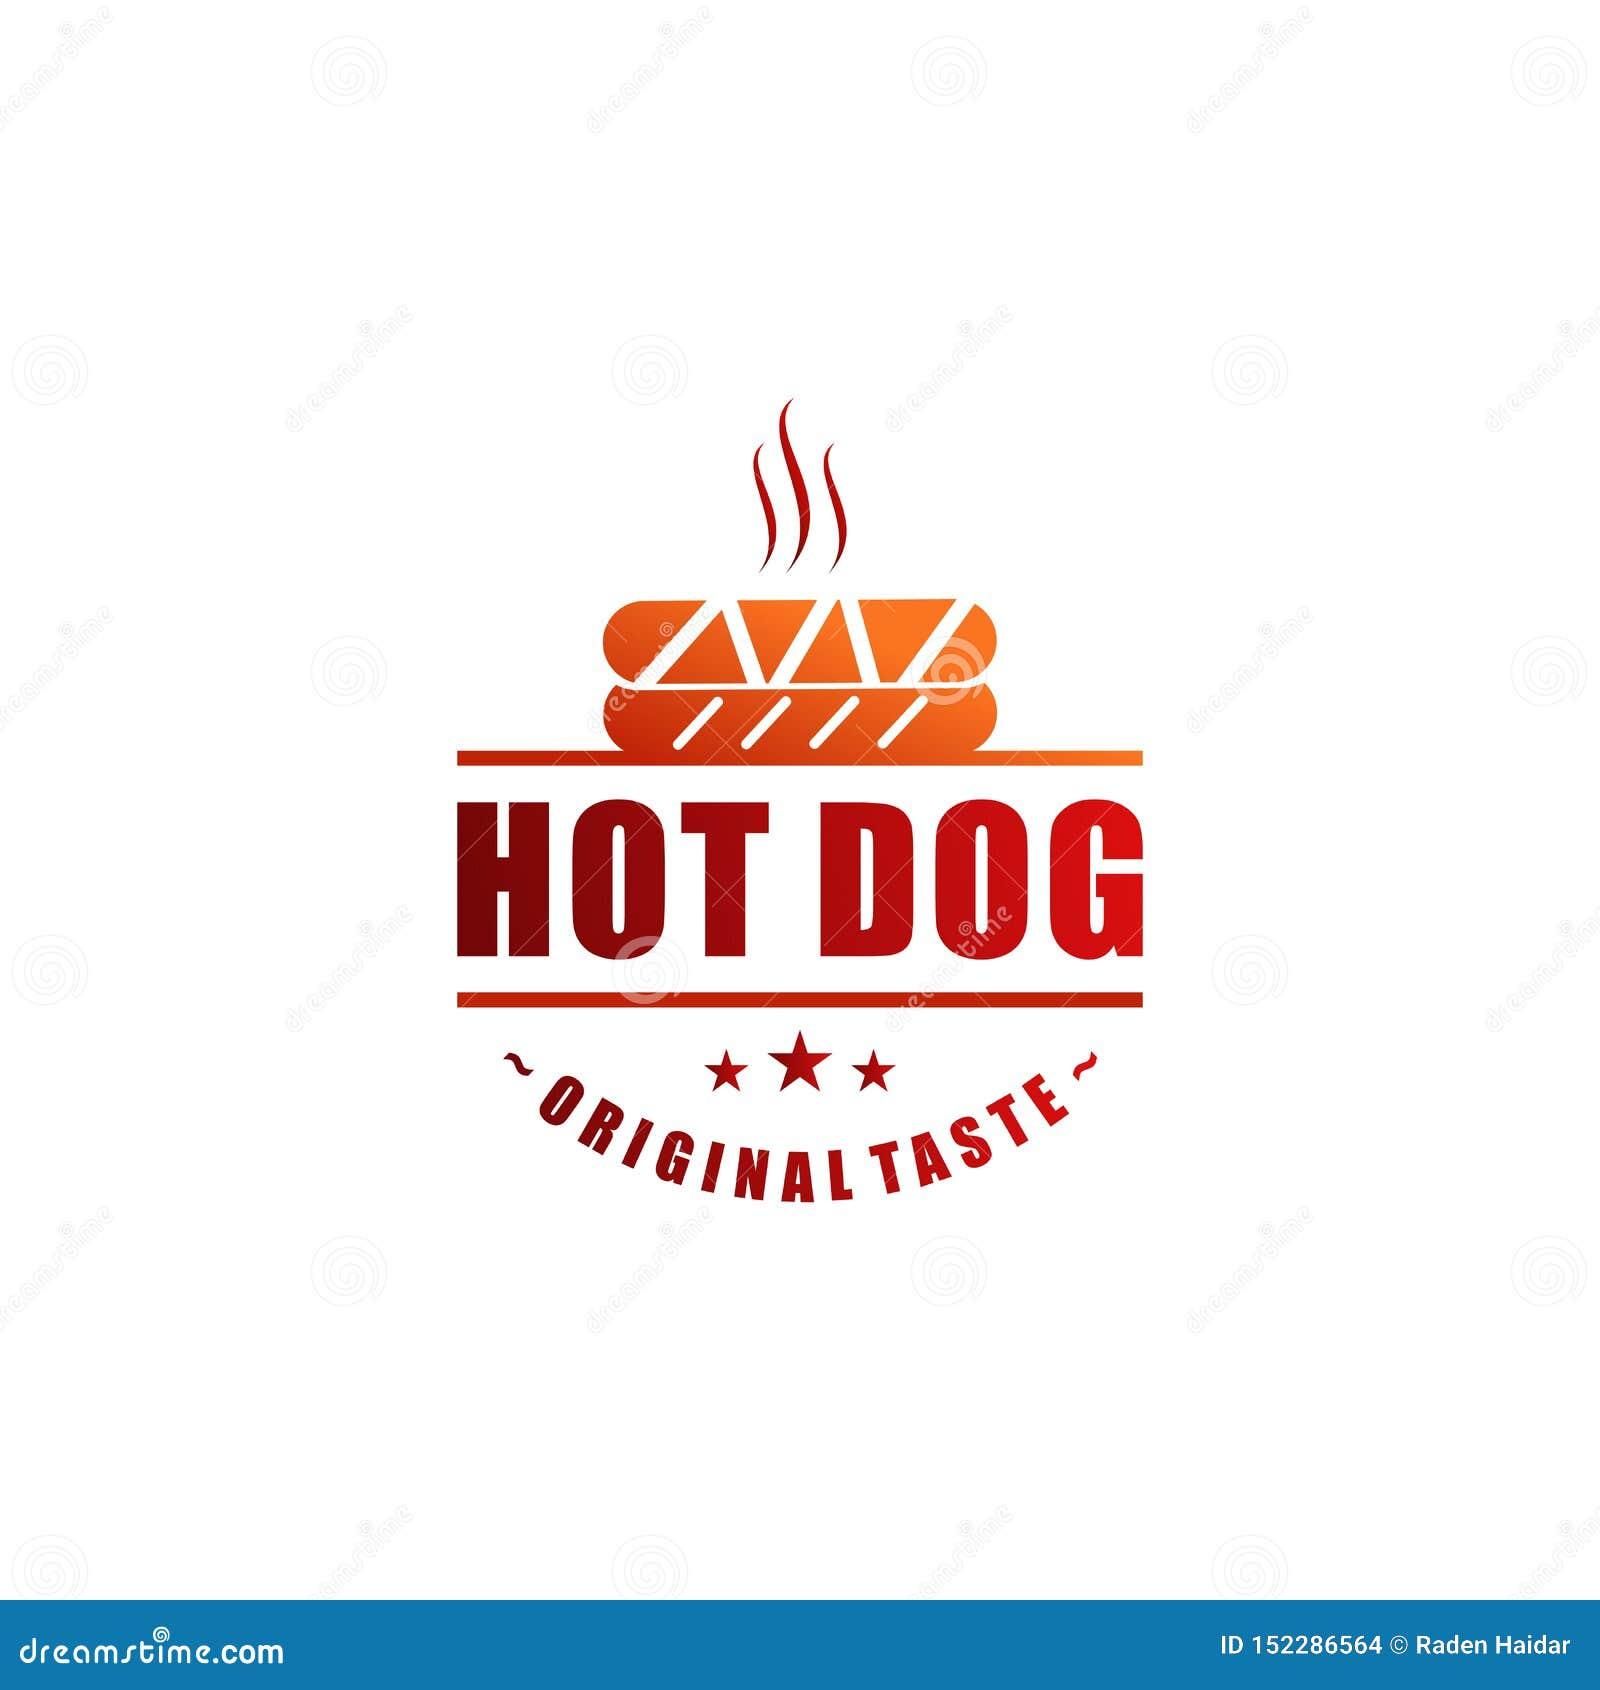 Dise?o del logotipo del restaurante